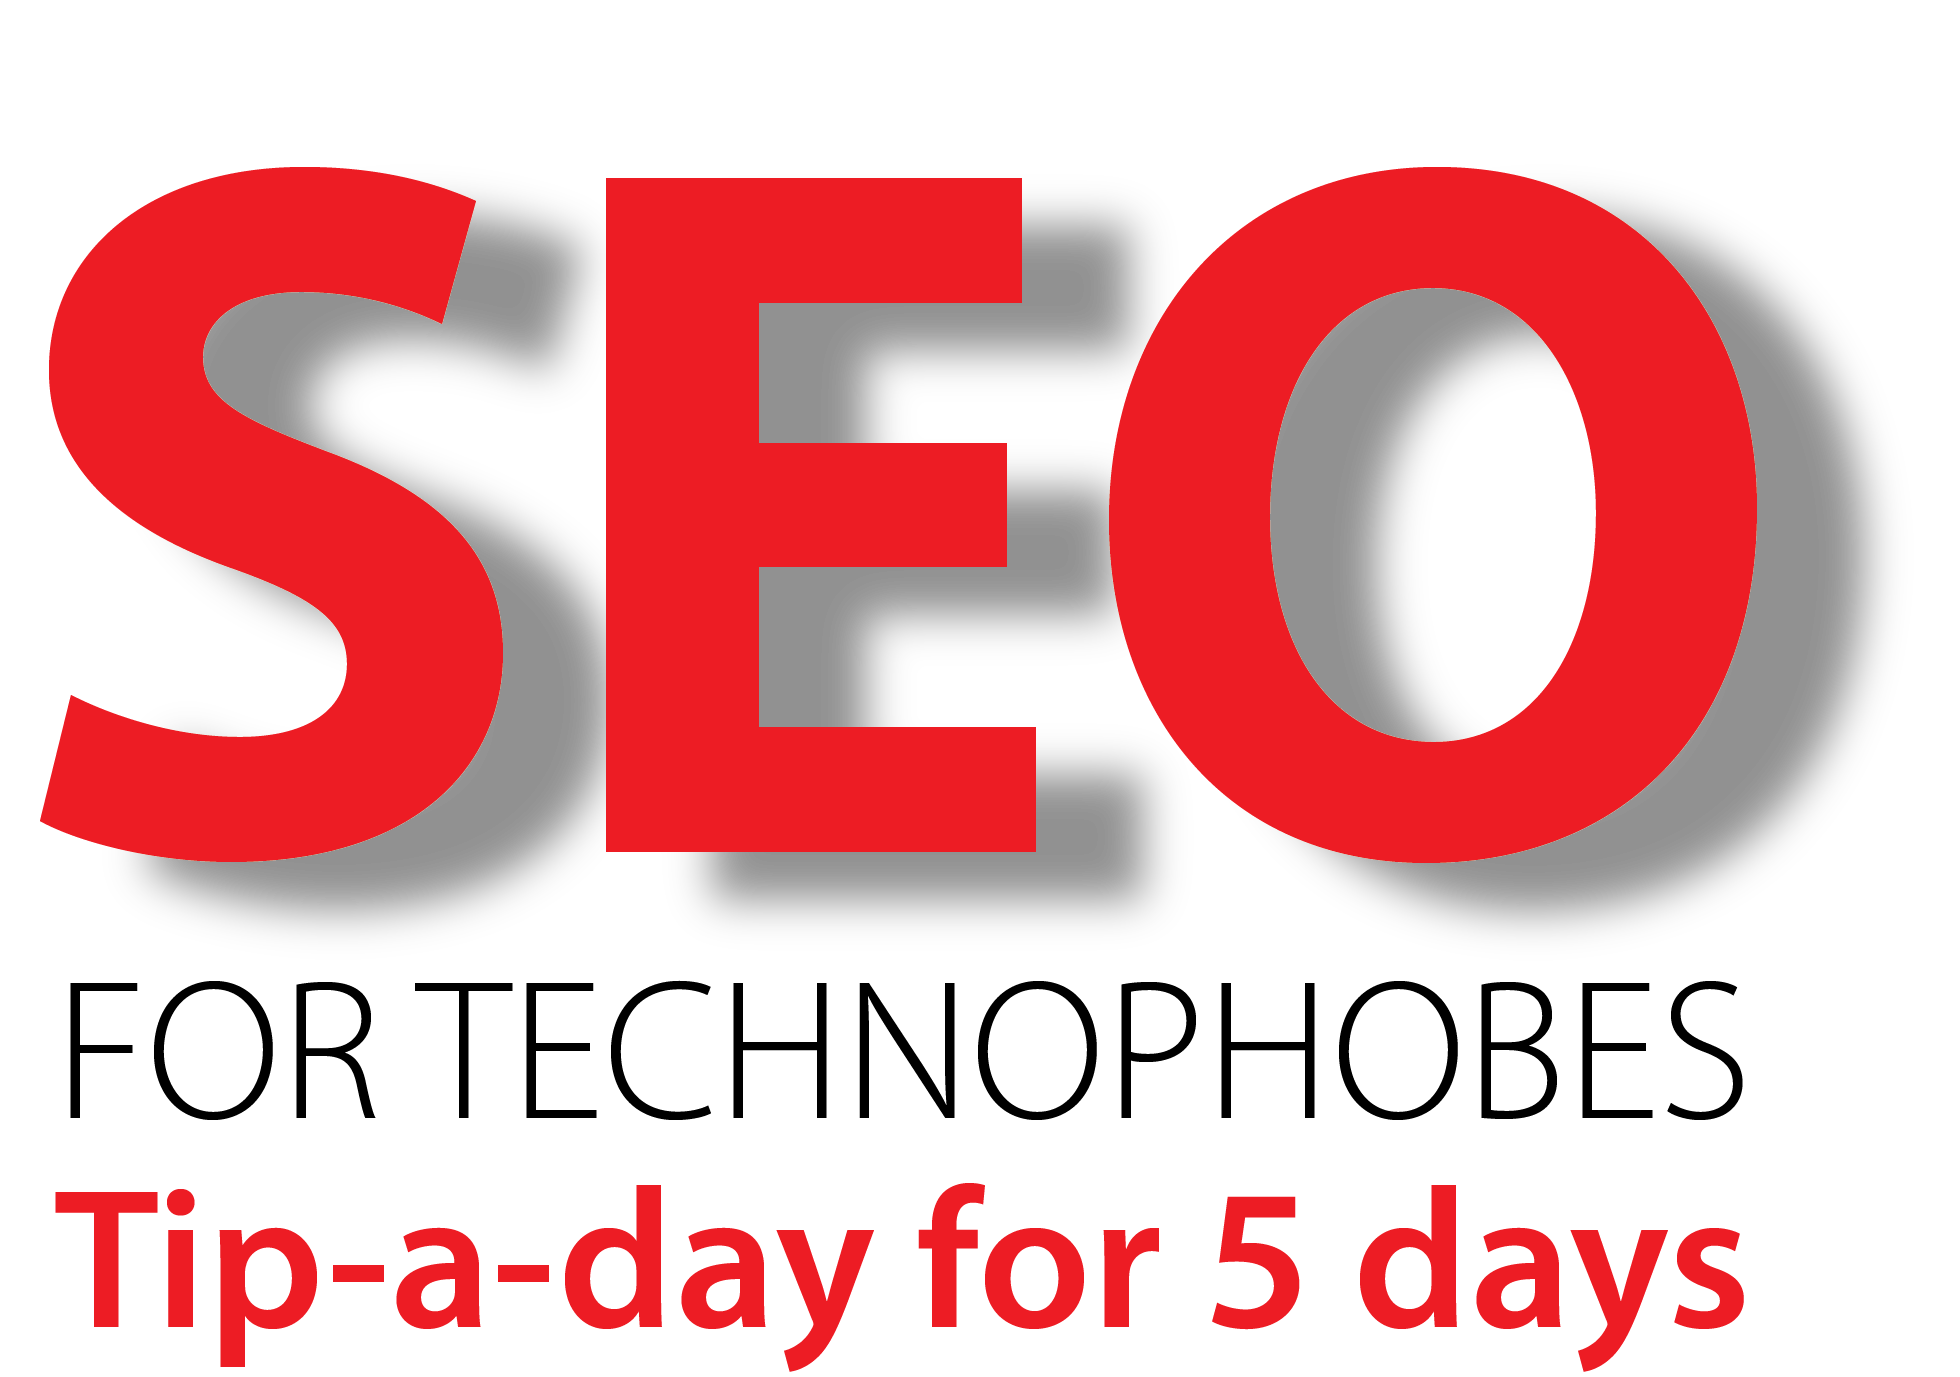 SEO for technophobes logo for 100Designs blog